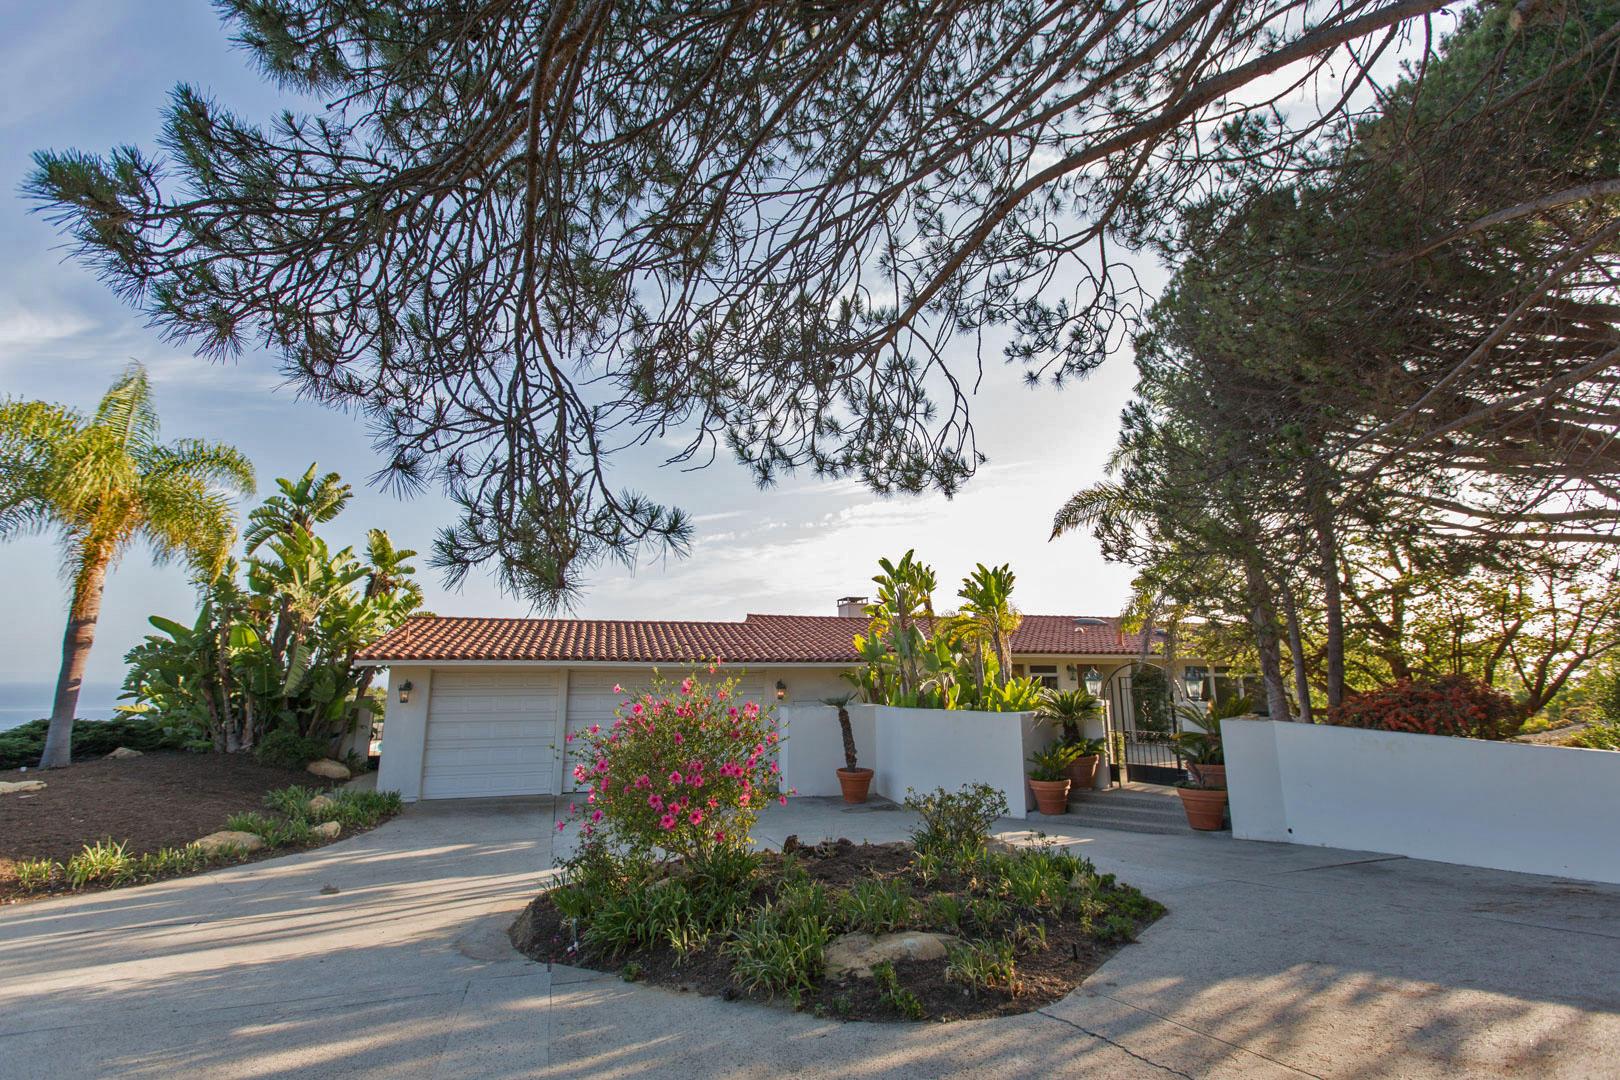 Property photo for 801 Sea Ranch Dr Santa Barbara, California 93109 - 15-3003